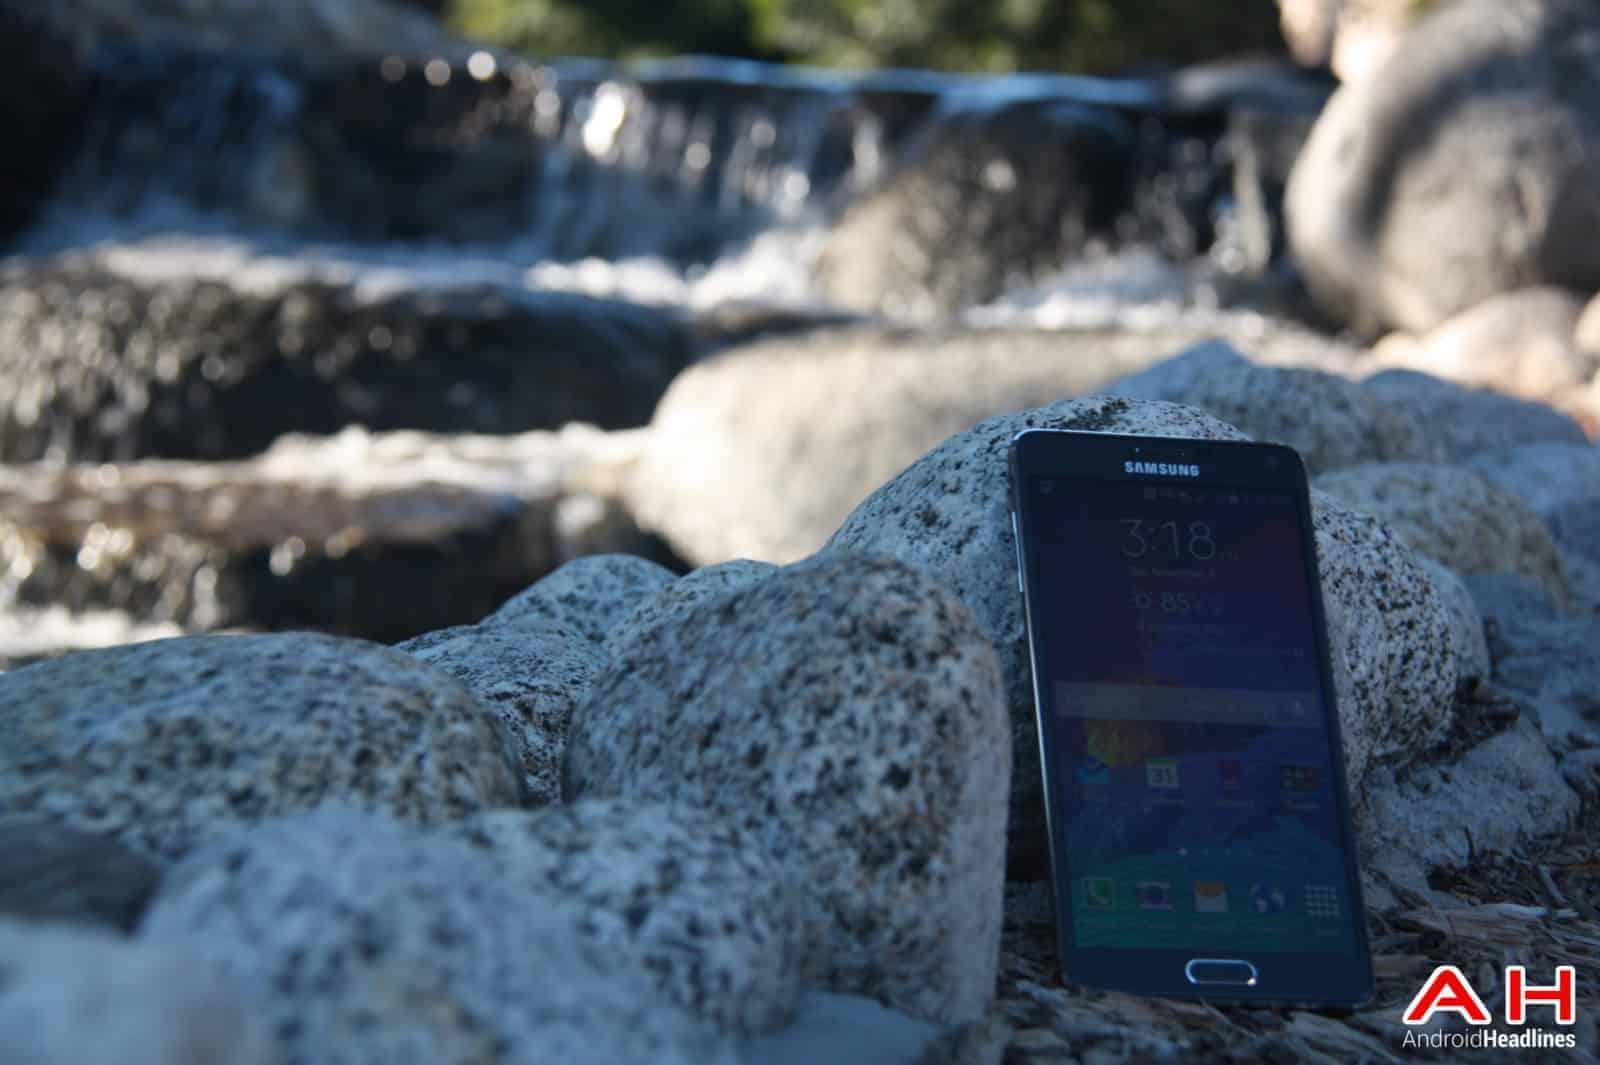 AH Samsung Galaxy Note 4 -47